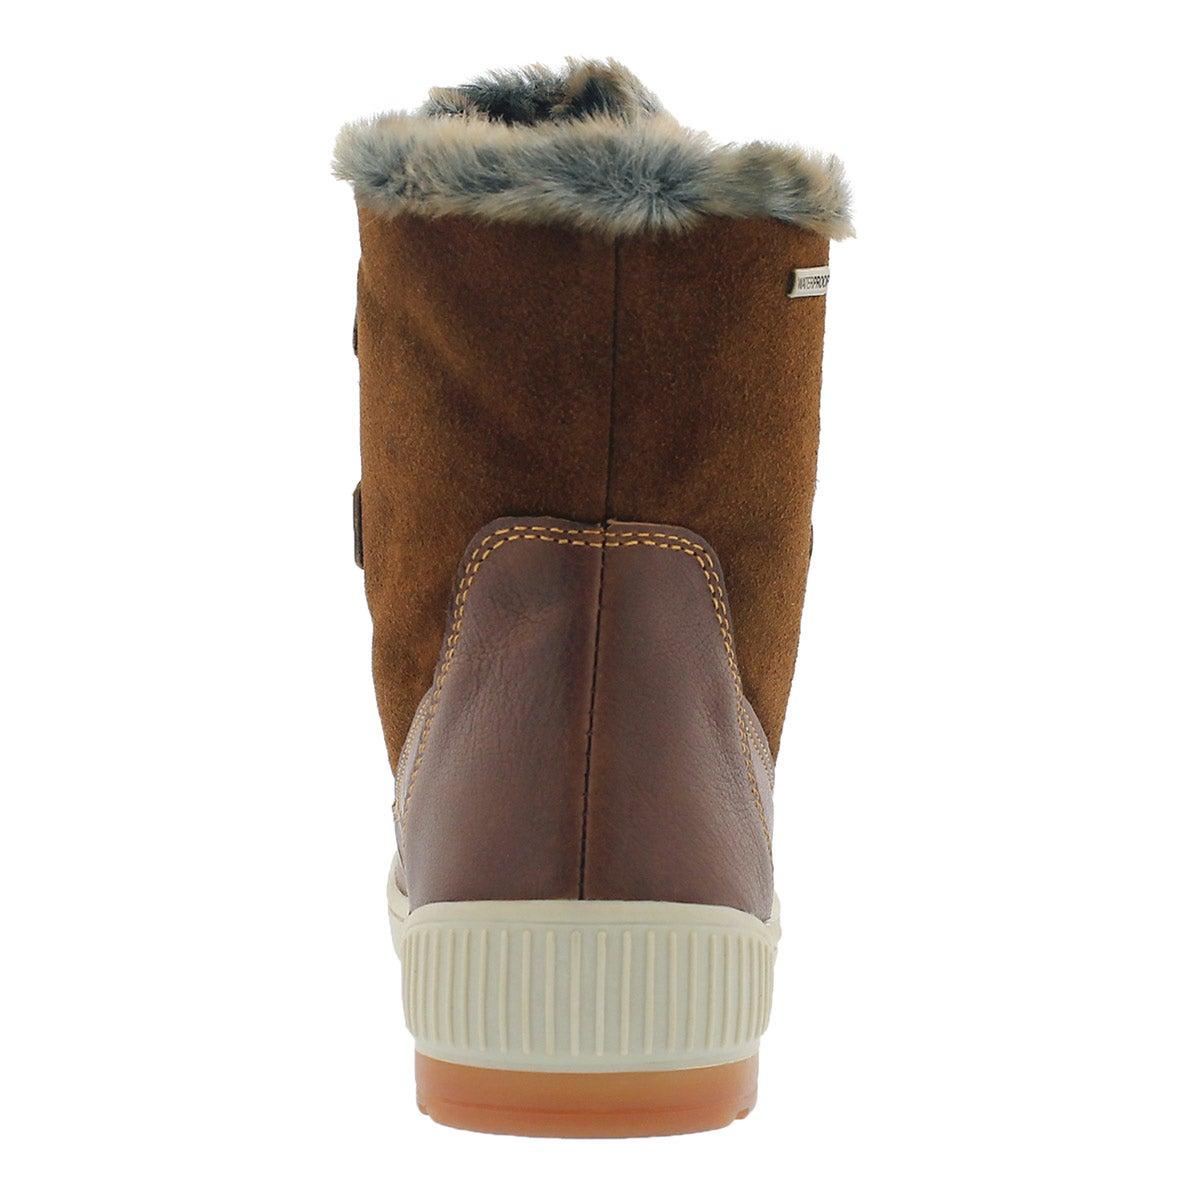 Lds Wilson dk brn/ches wtpf winter boot